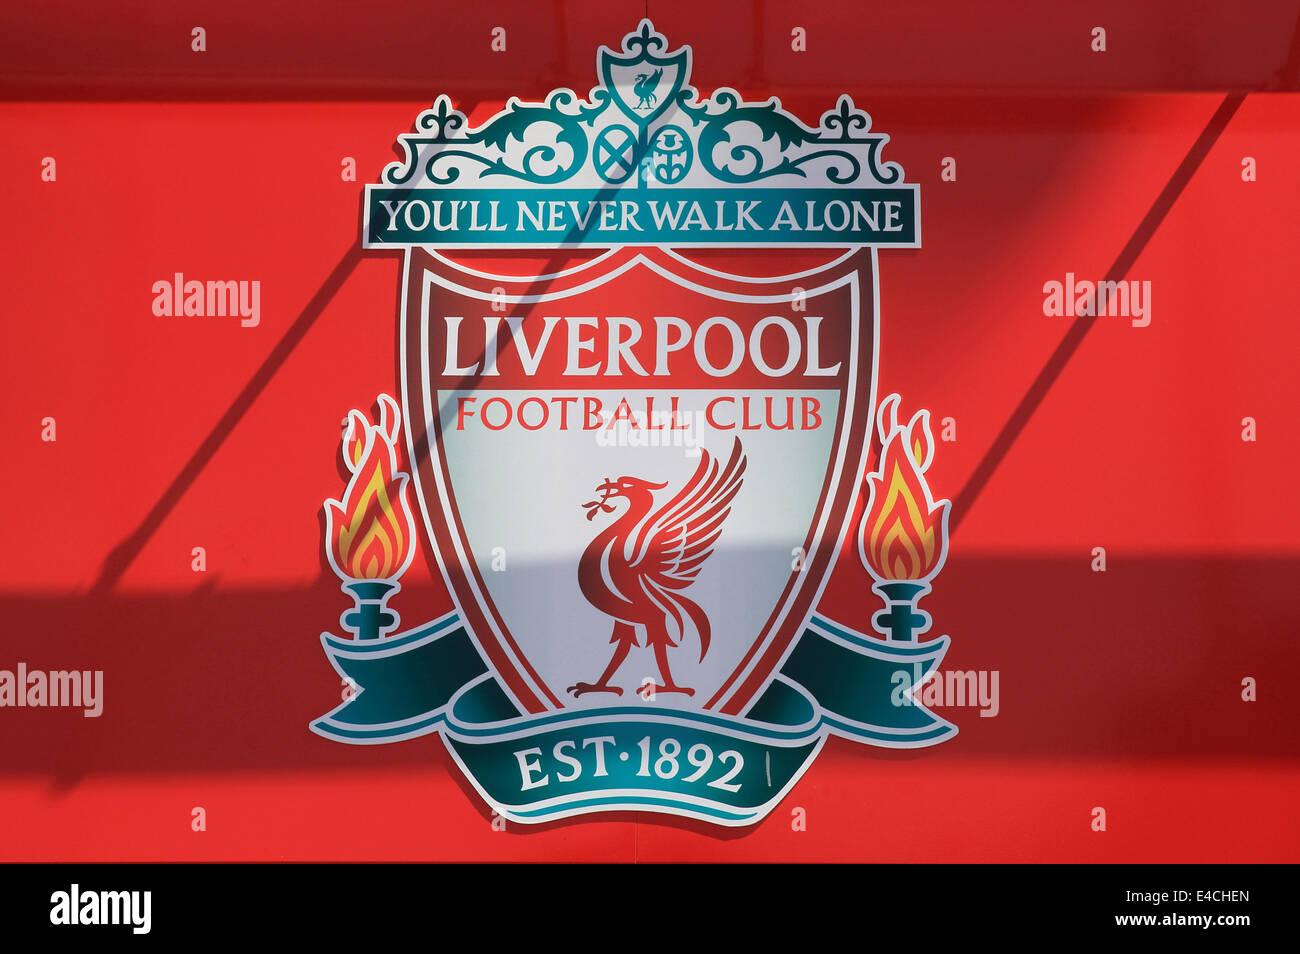 The Liverpool Football Club Emblem You Ll Never Walk Alone At